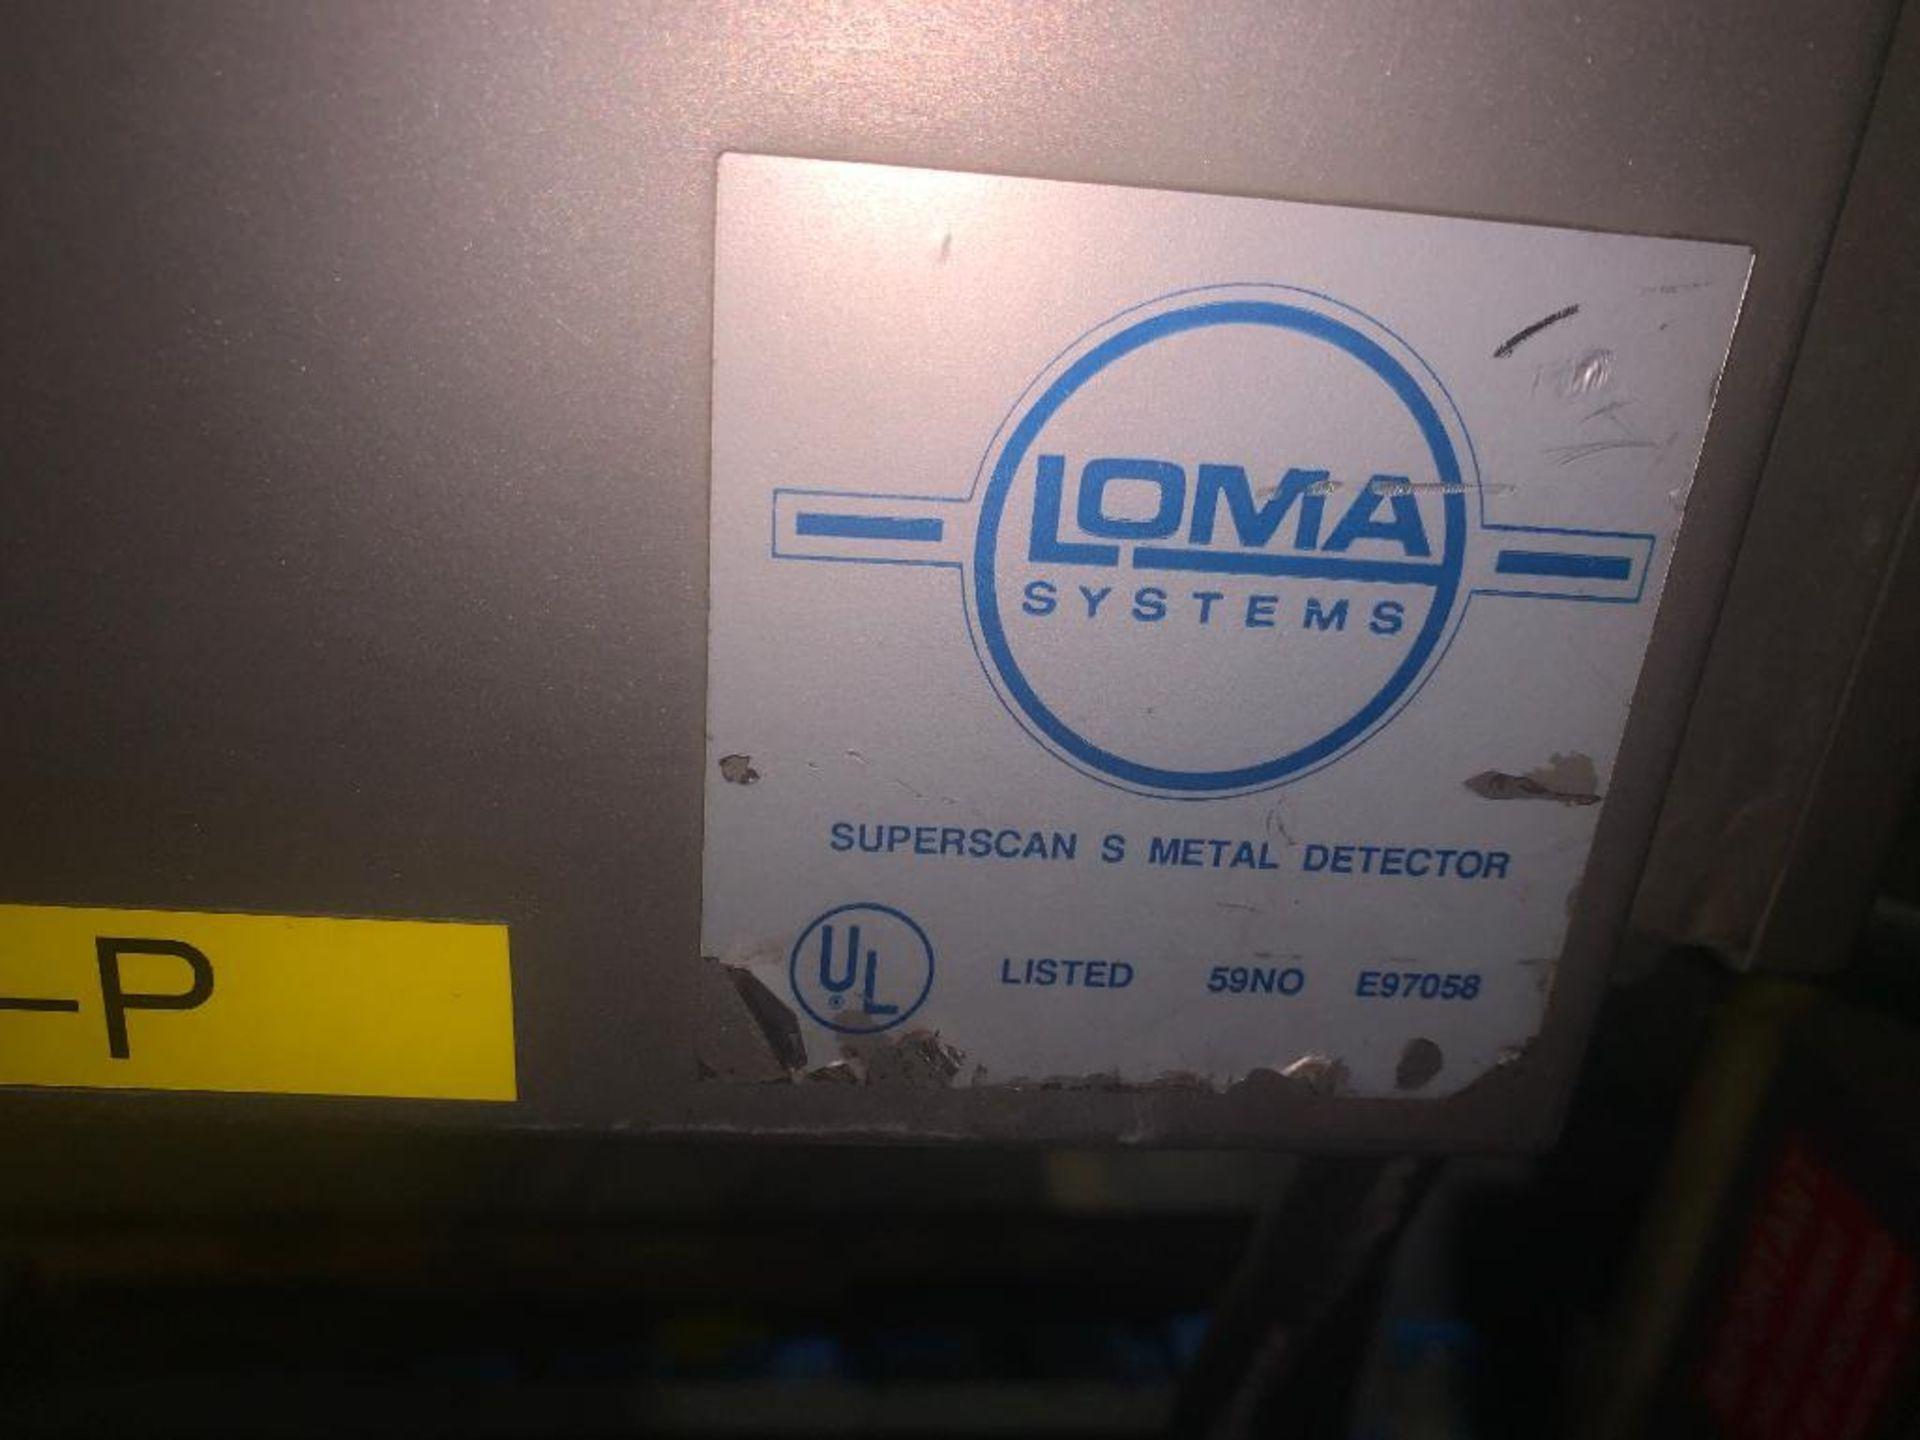 Loma metal detector - Image 2 of 10